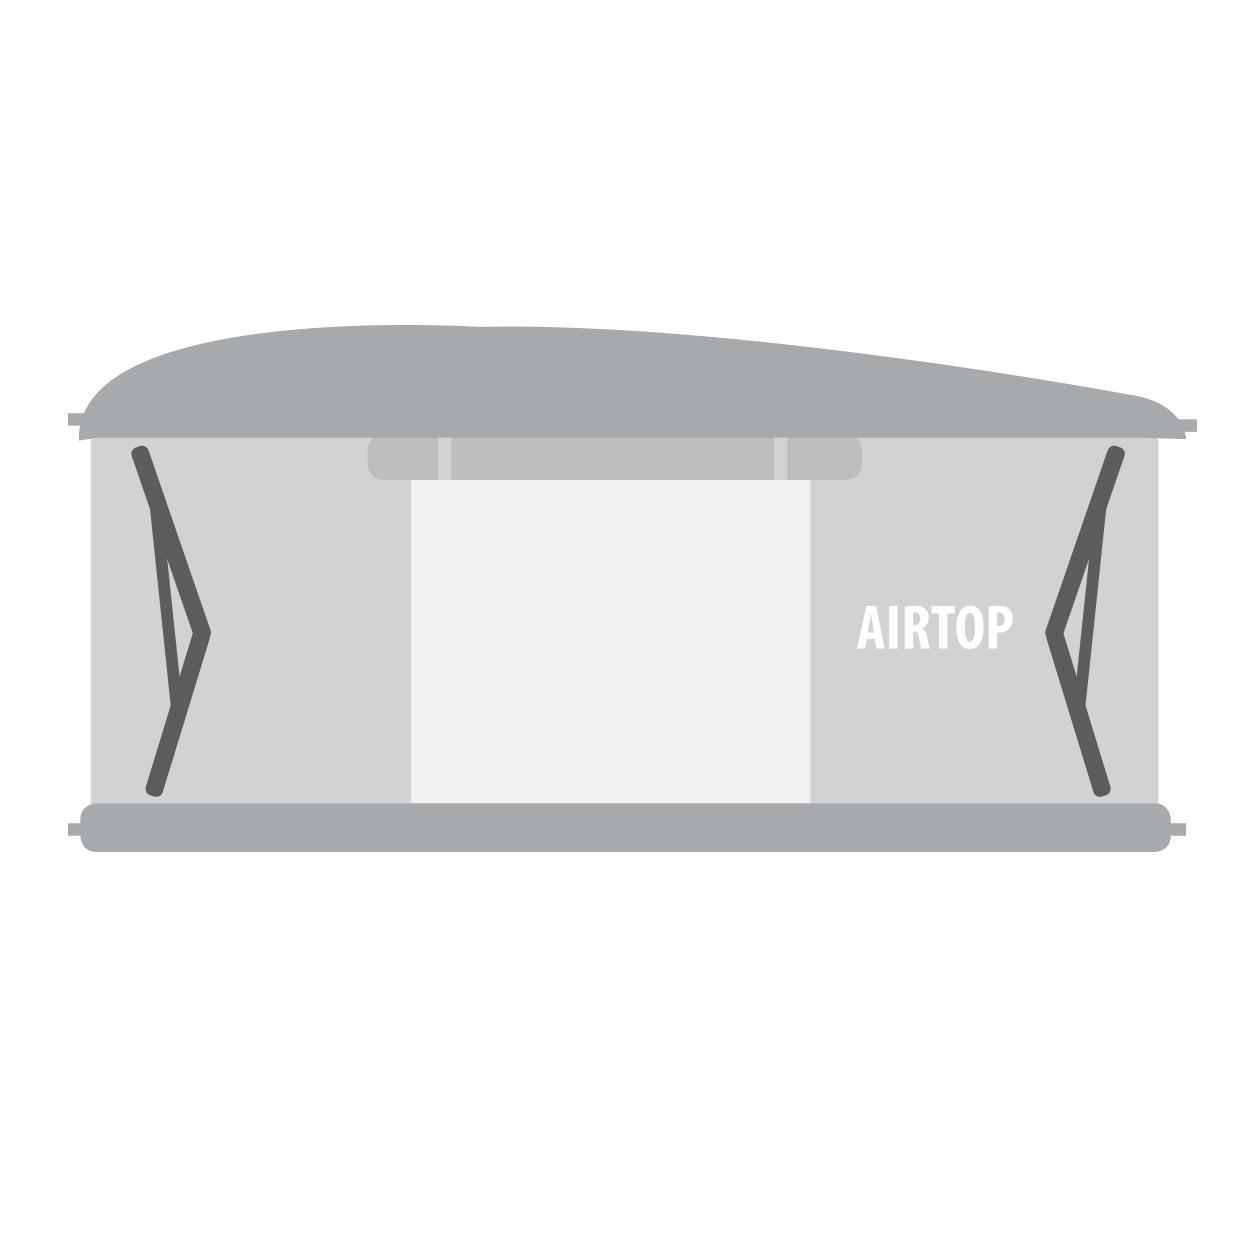 Airtop-Gasdruckfedernwlo9ztkTrA0TO